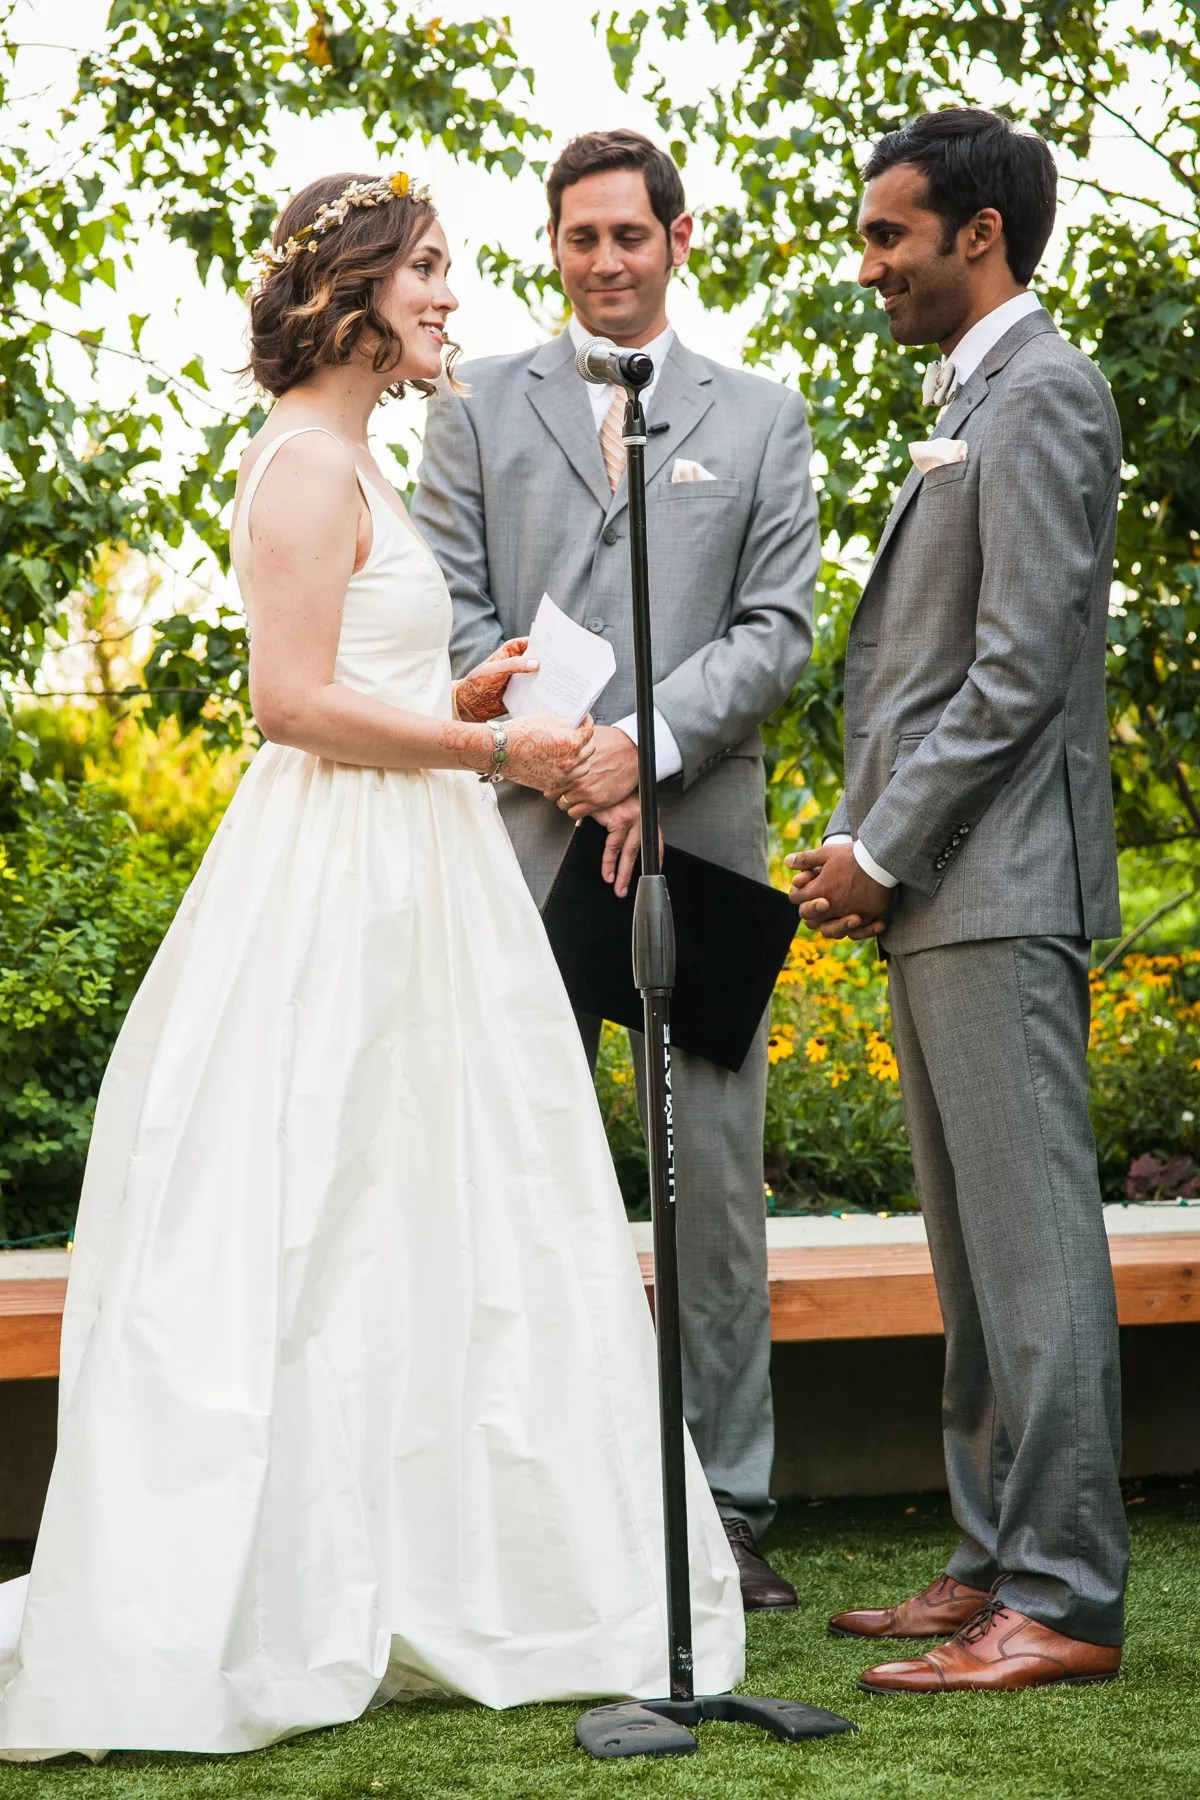 civil wedding dress for groom and bride civil wedding ceremony dresses Short Wedding Hairstyles